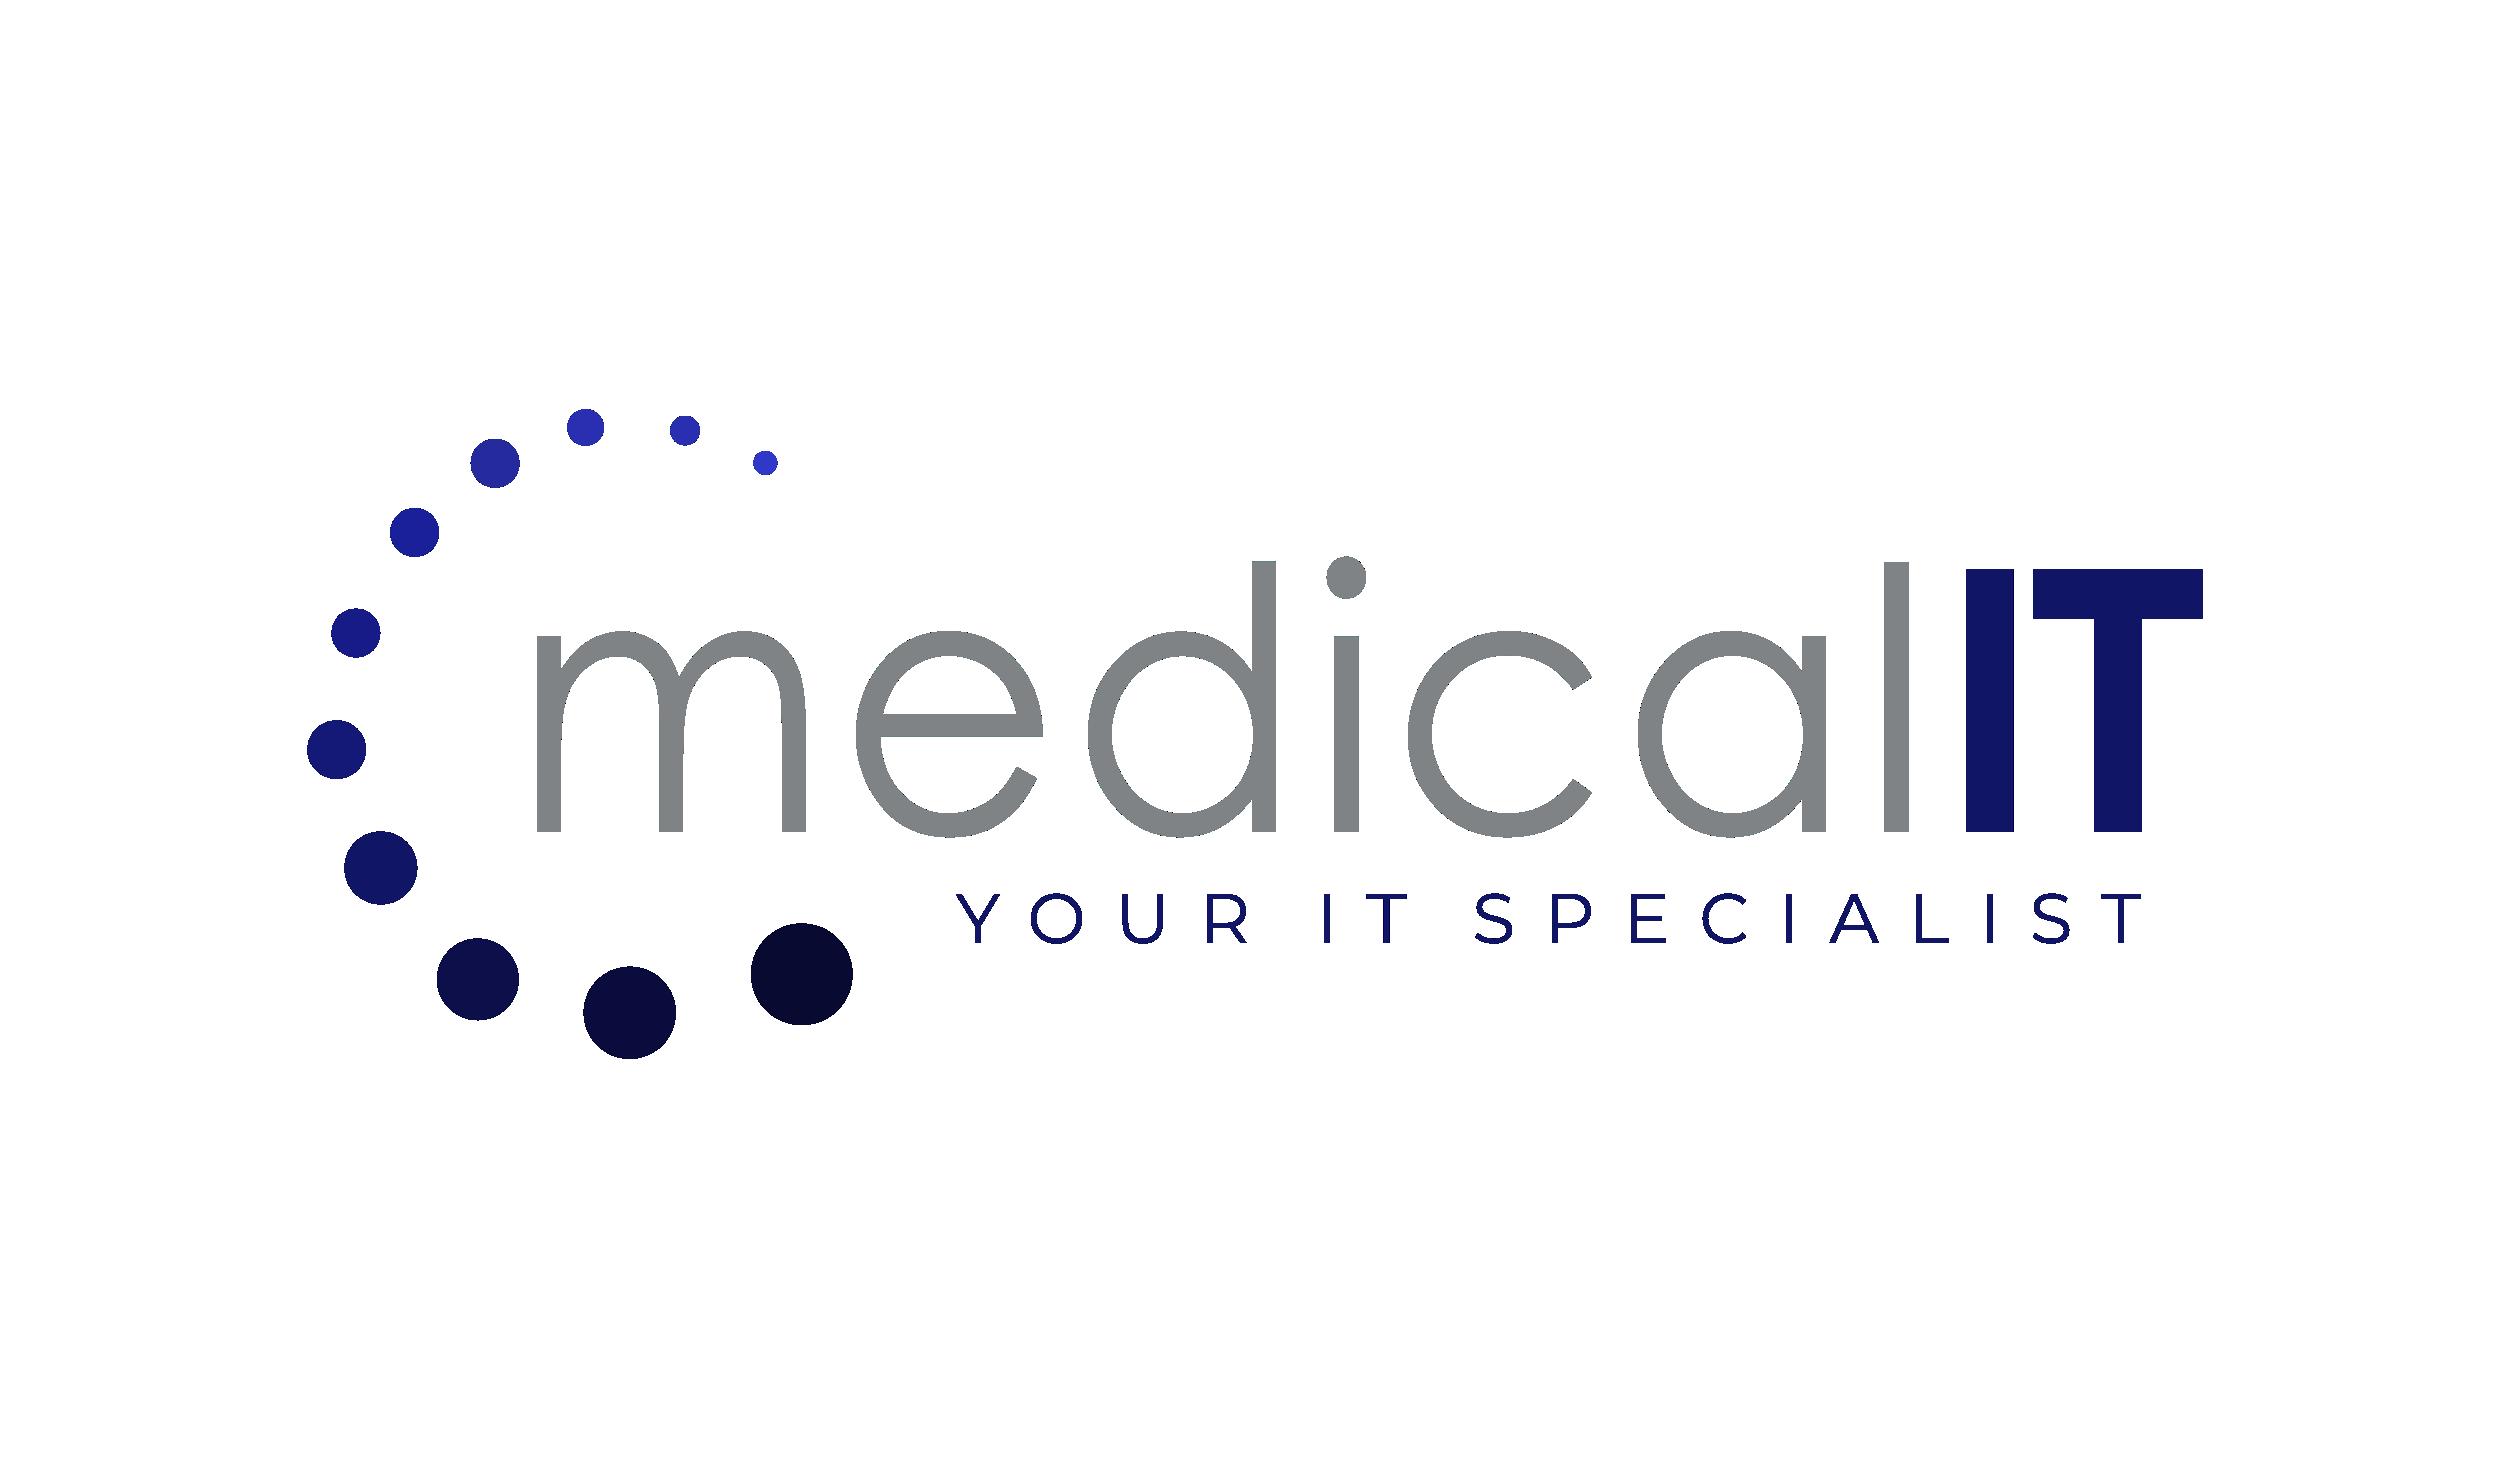 Medical IT